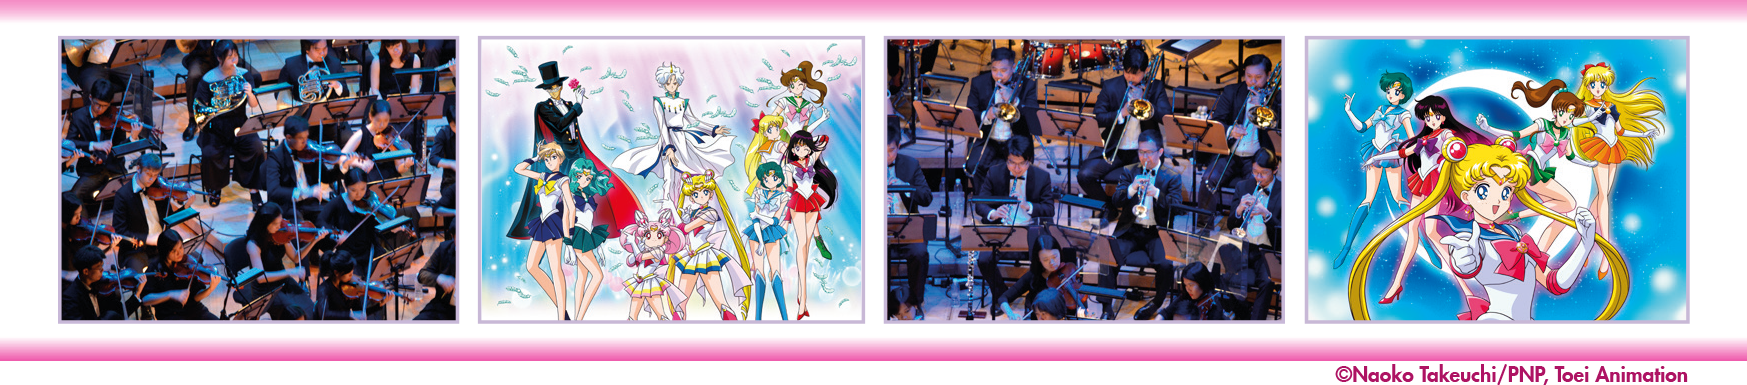 Sailor Moon Symphony